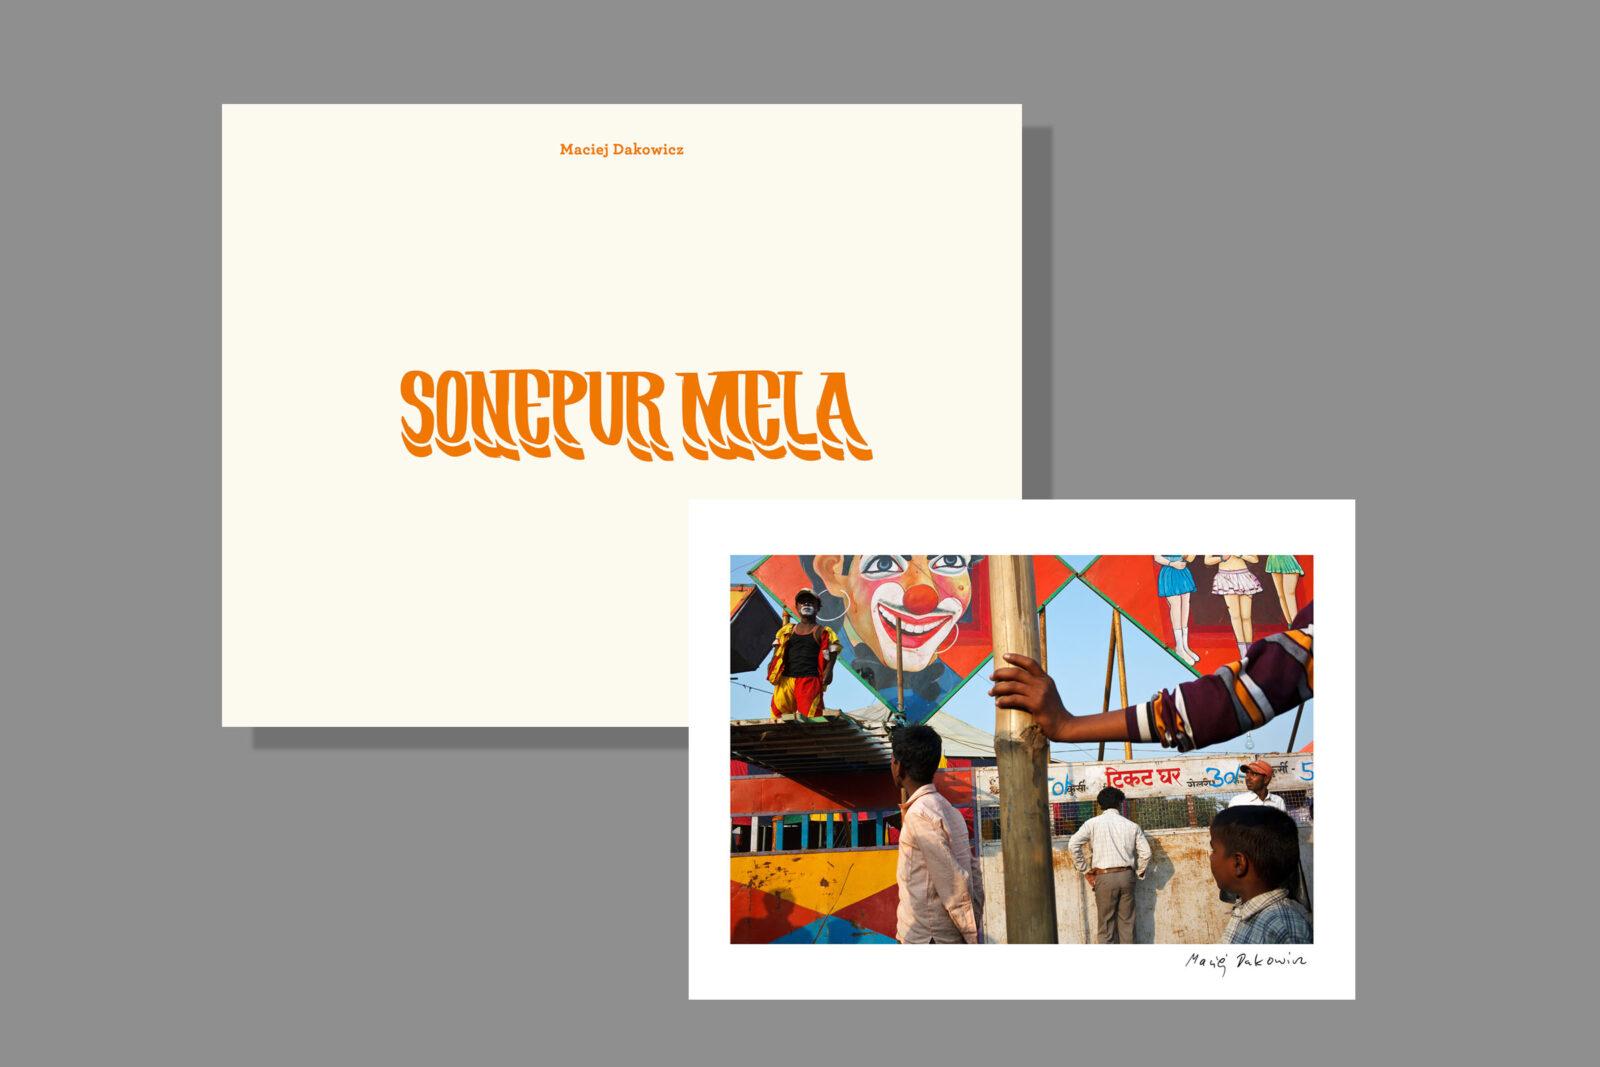 book_Sonepur_Mela_Maciej_Dakowicz_cover_special_edition_2021_orange_prints_2-1600x1067.jpg